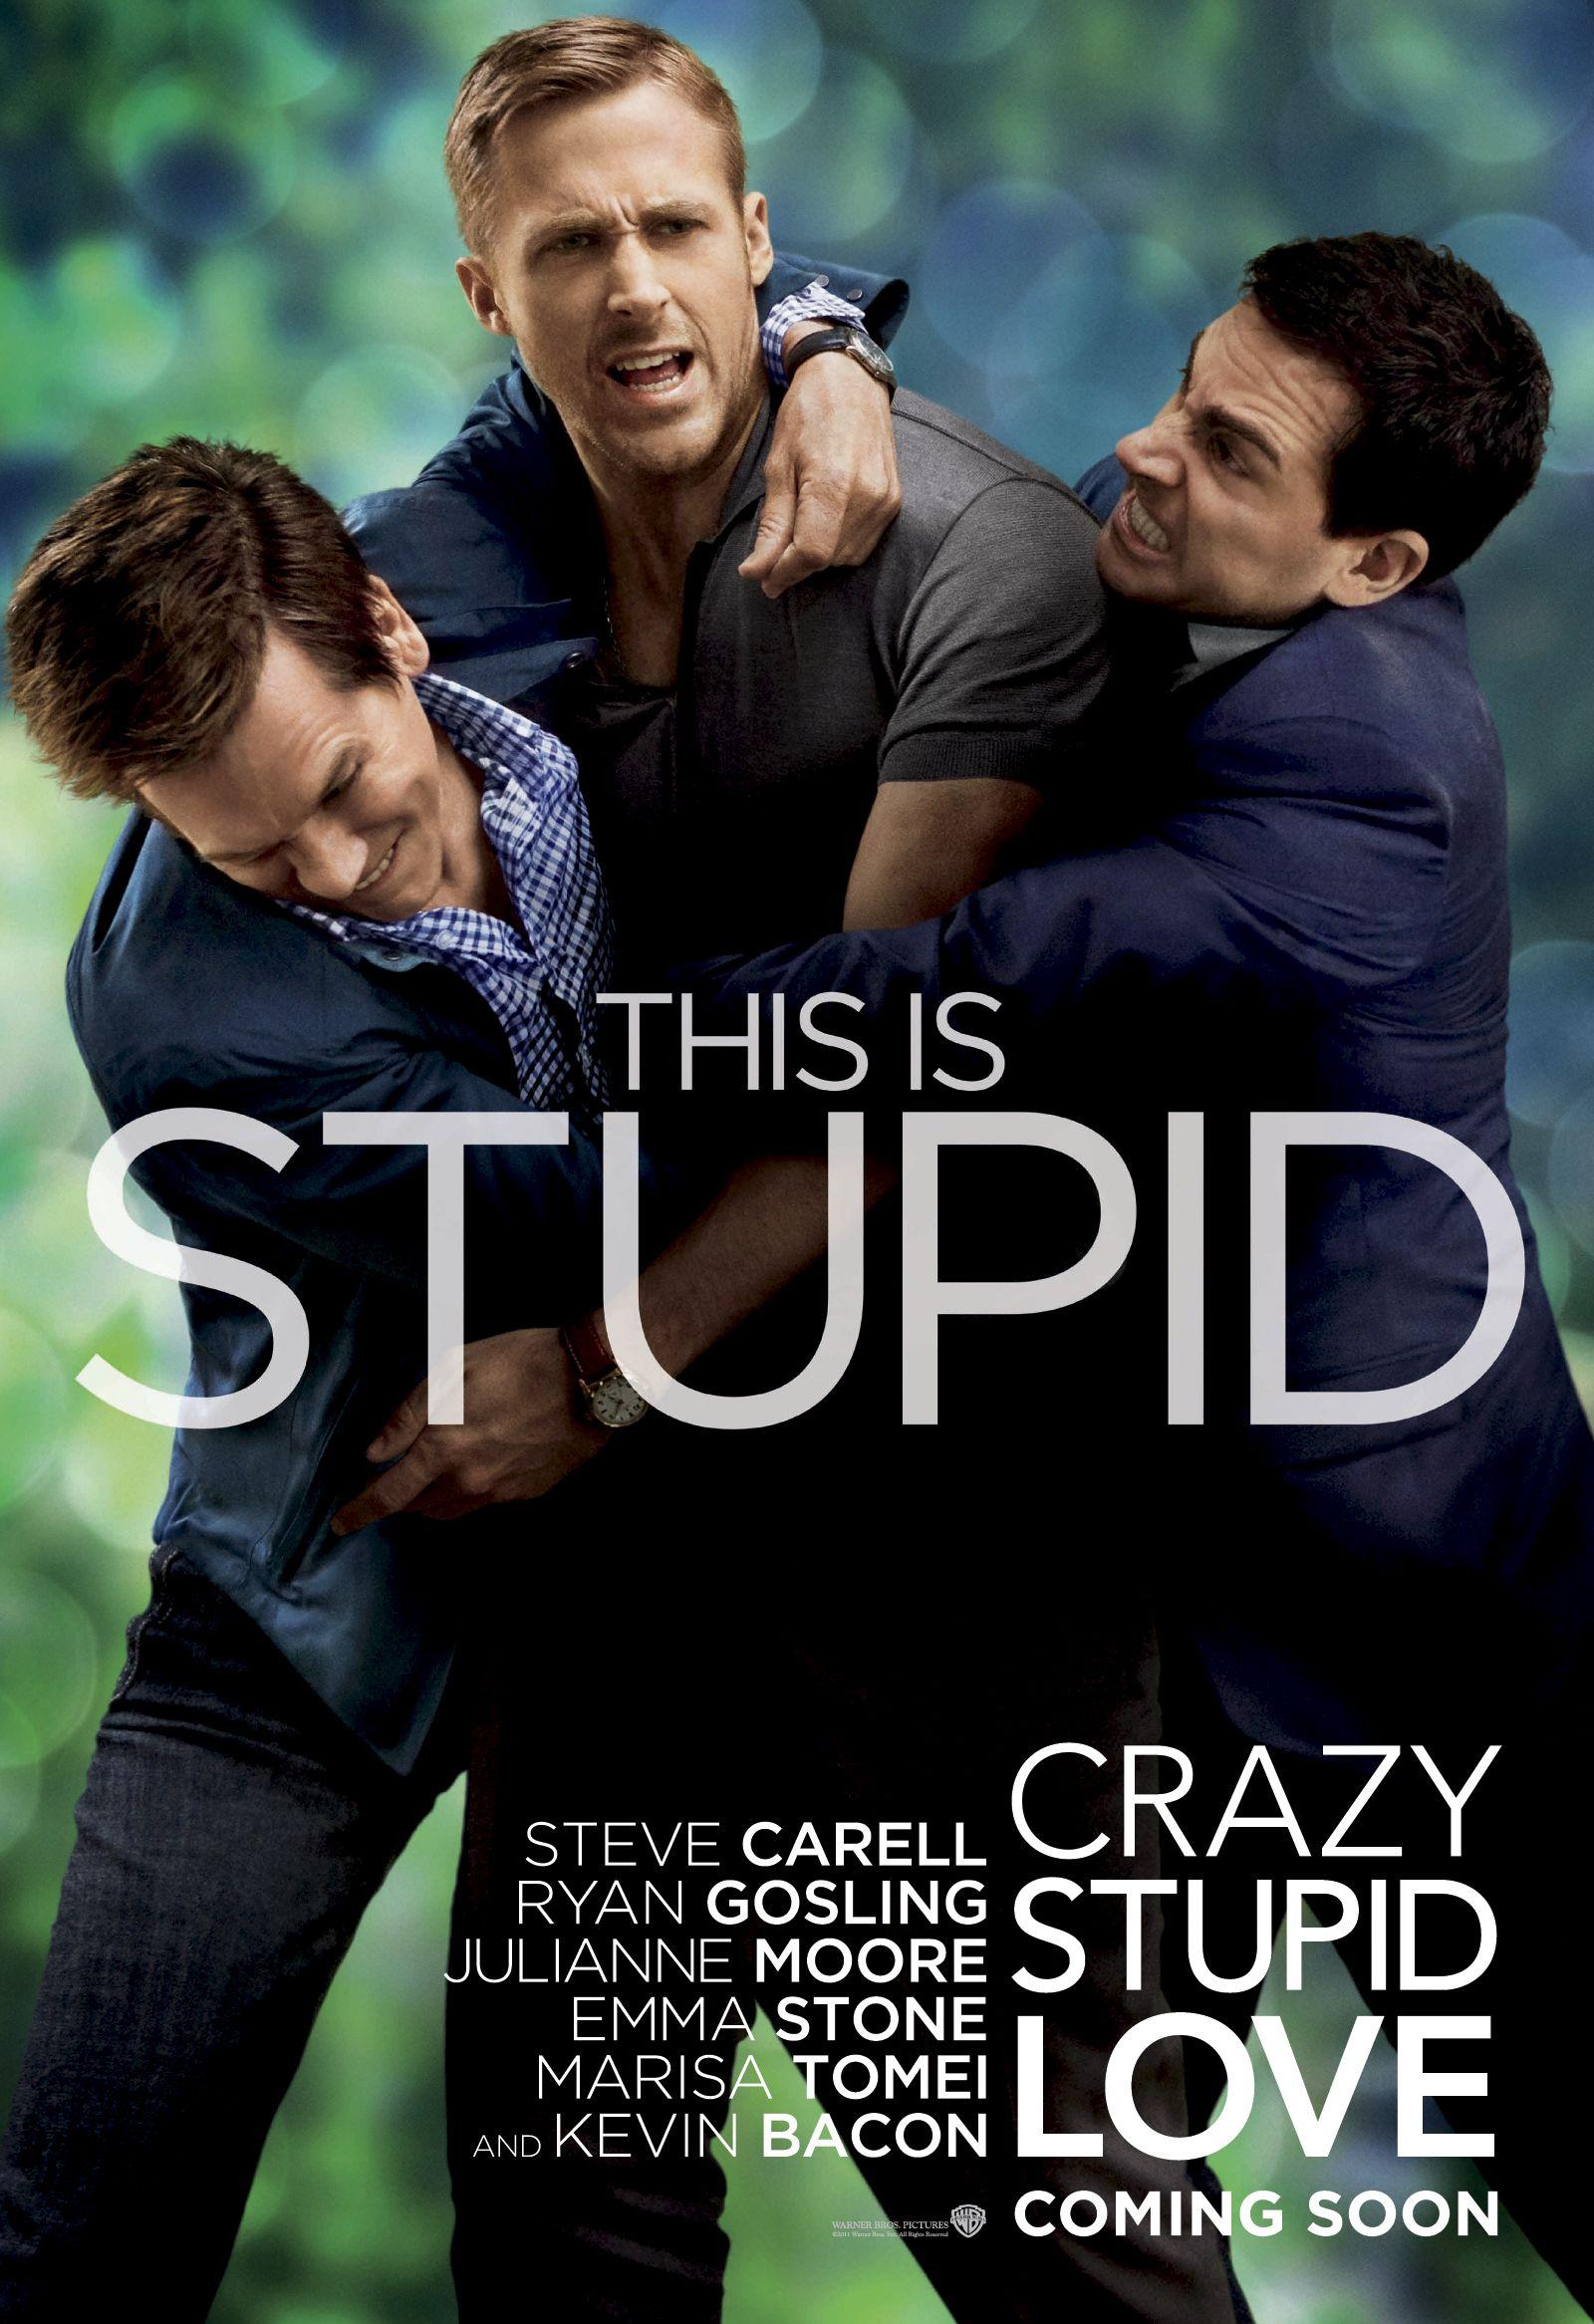 Crazy Stupid Love Movie Posters Crazy Stupid Love Movie Crazy